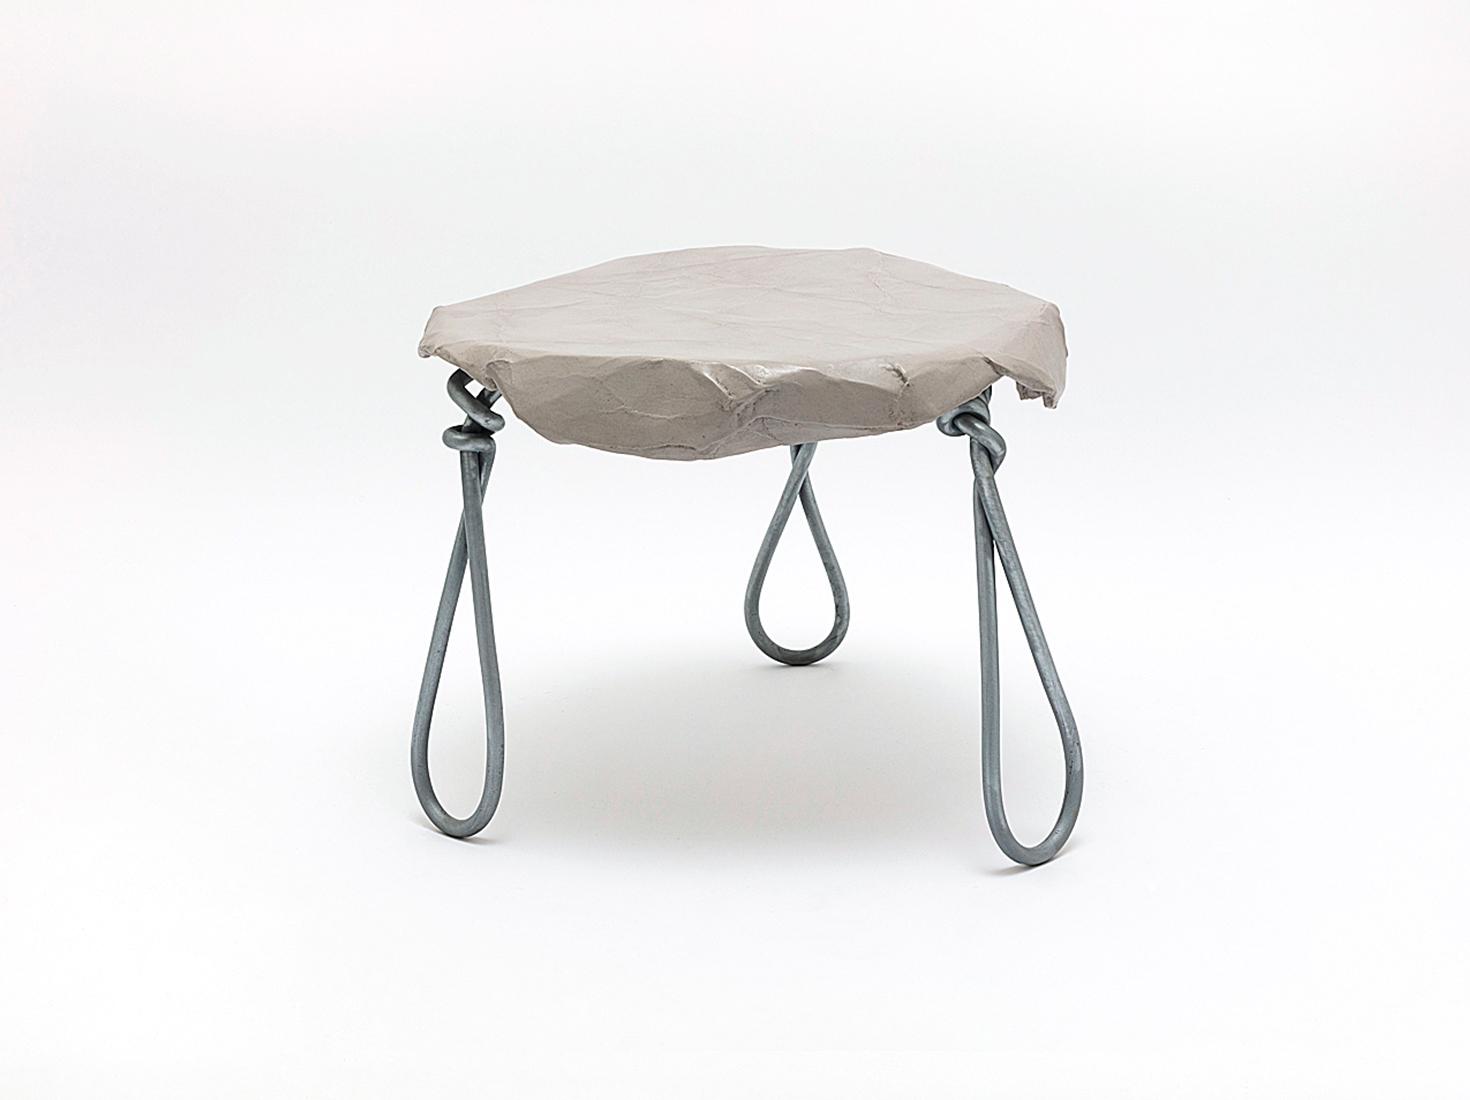 Фэй Тугуд мебель фото